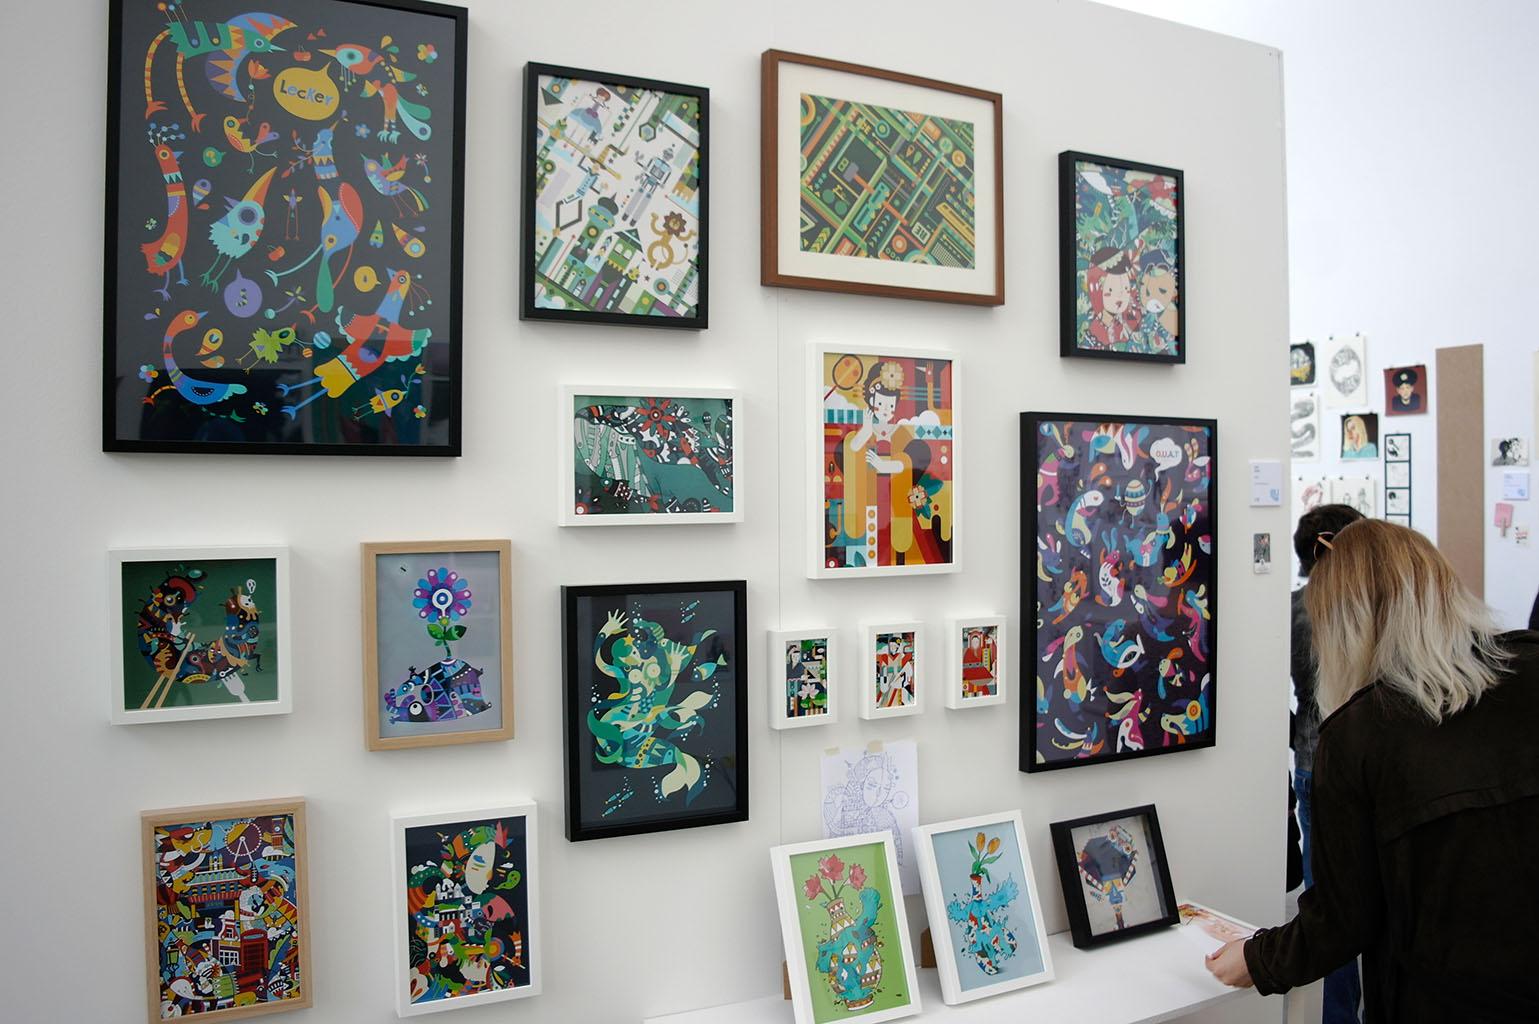 illu16-illustratoren-festival-köln-vögel-grafik-hans-christian-sanladerer